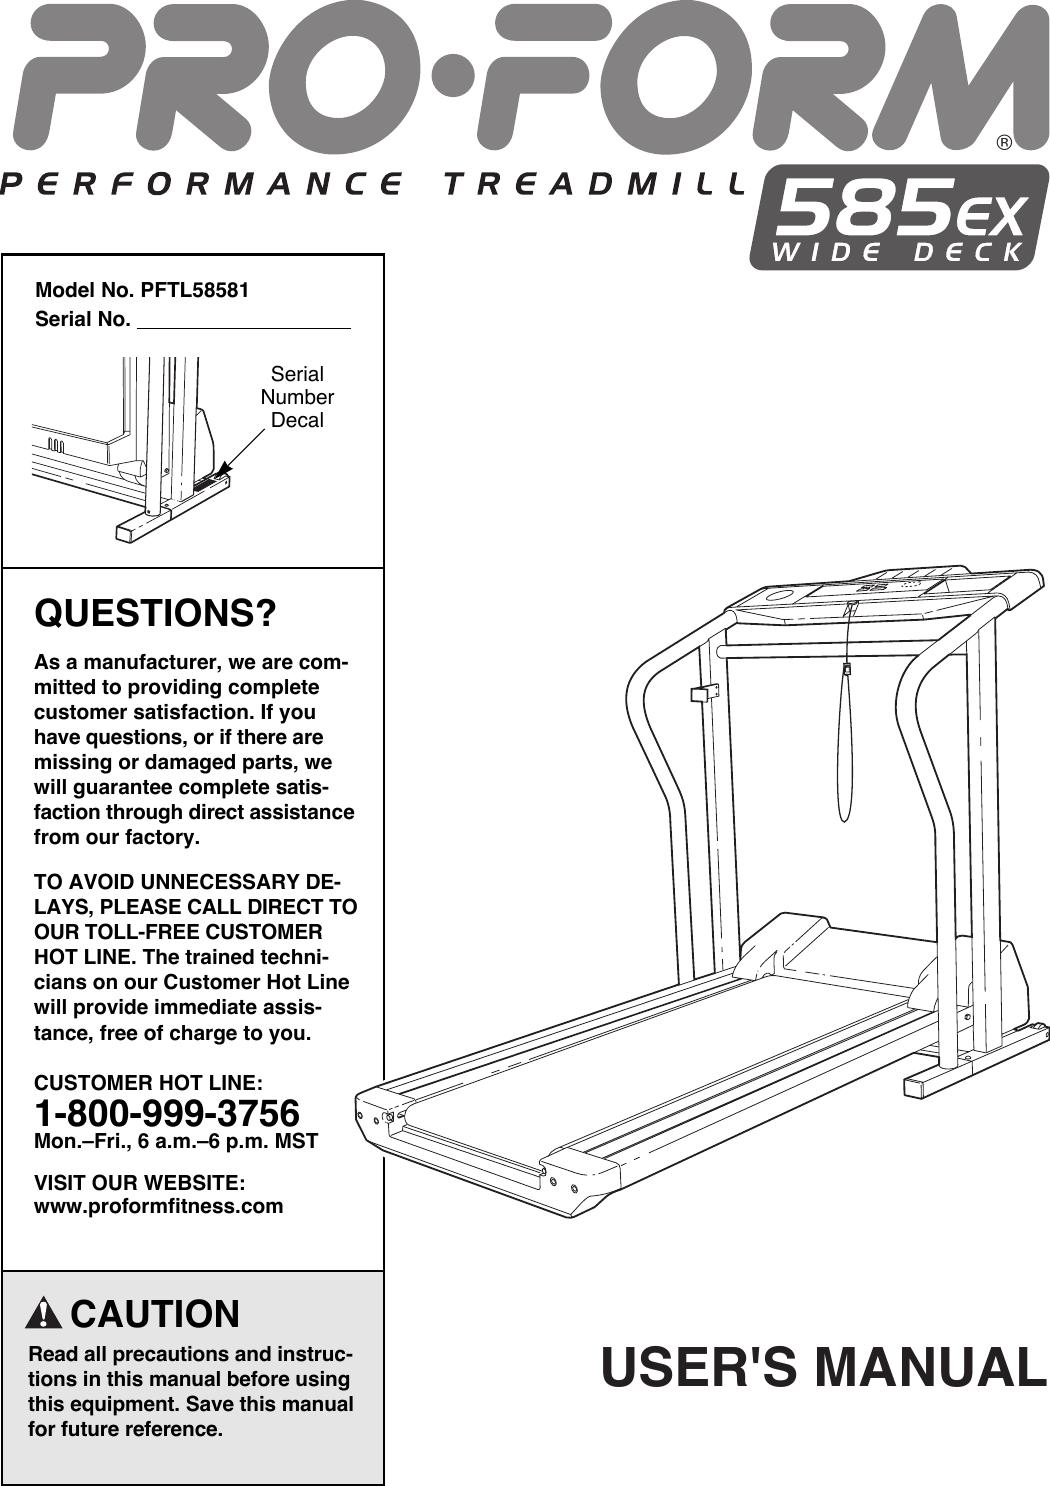 Husky F226vwd 585 Manual Guide